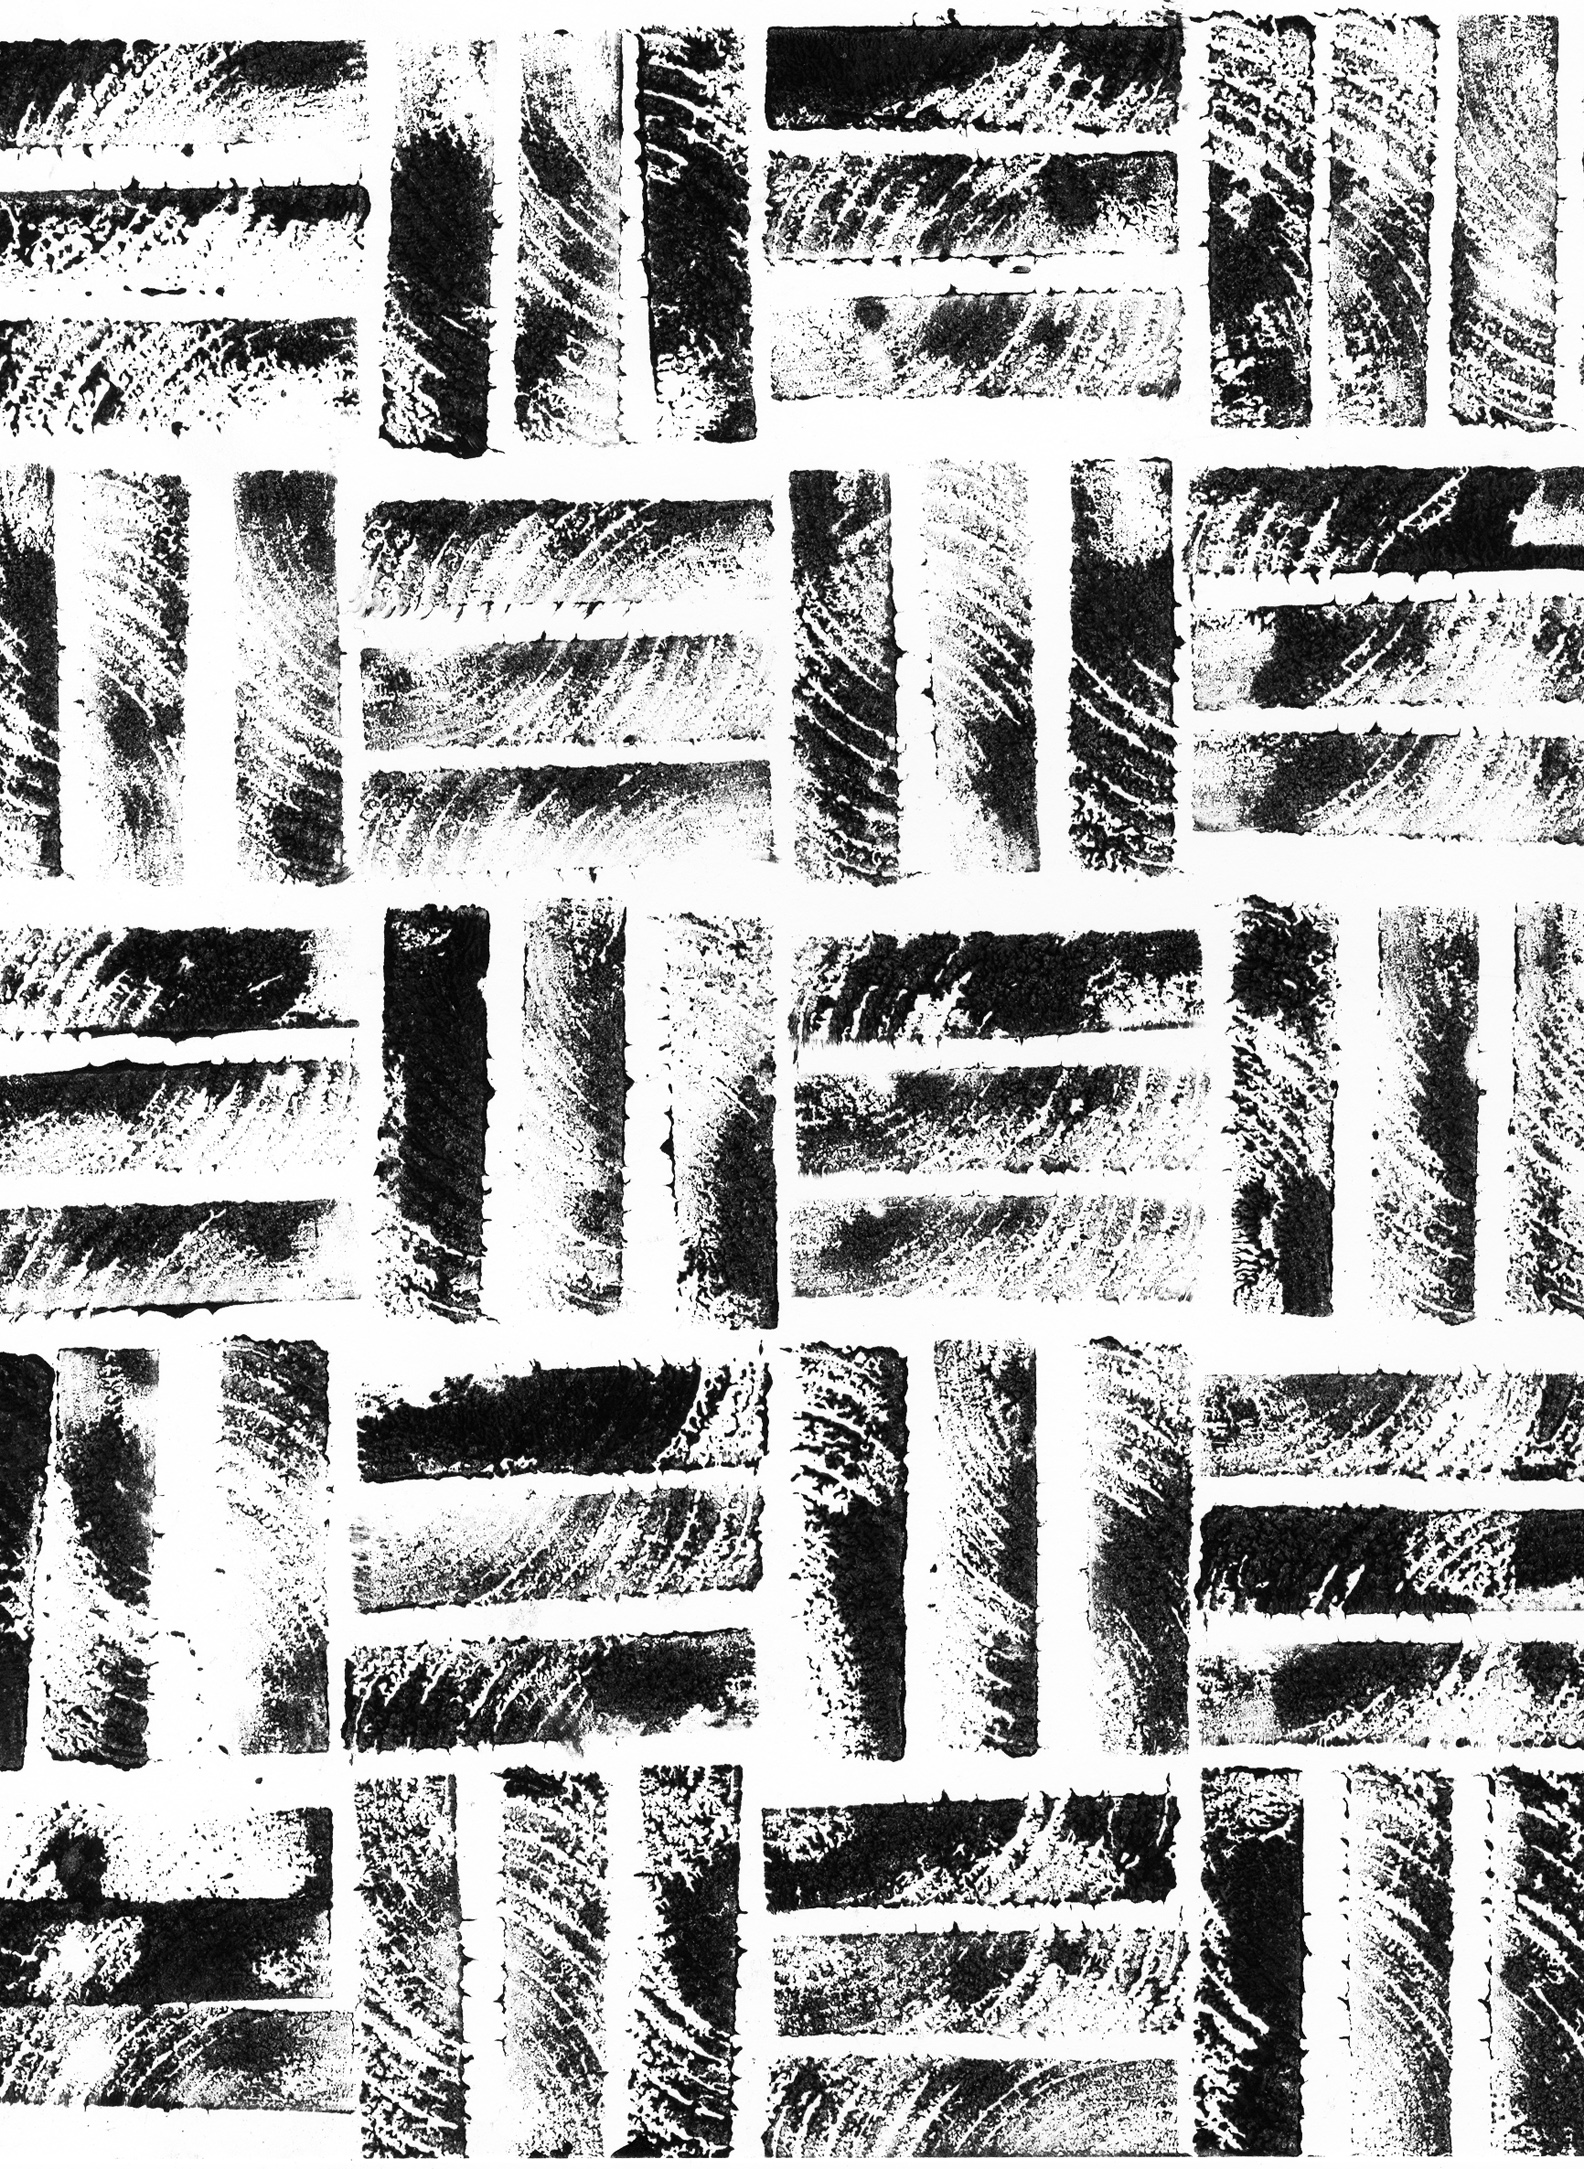 003_bw_threepieceblock_print.jpg